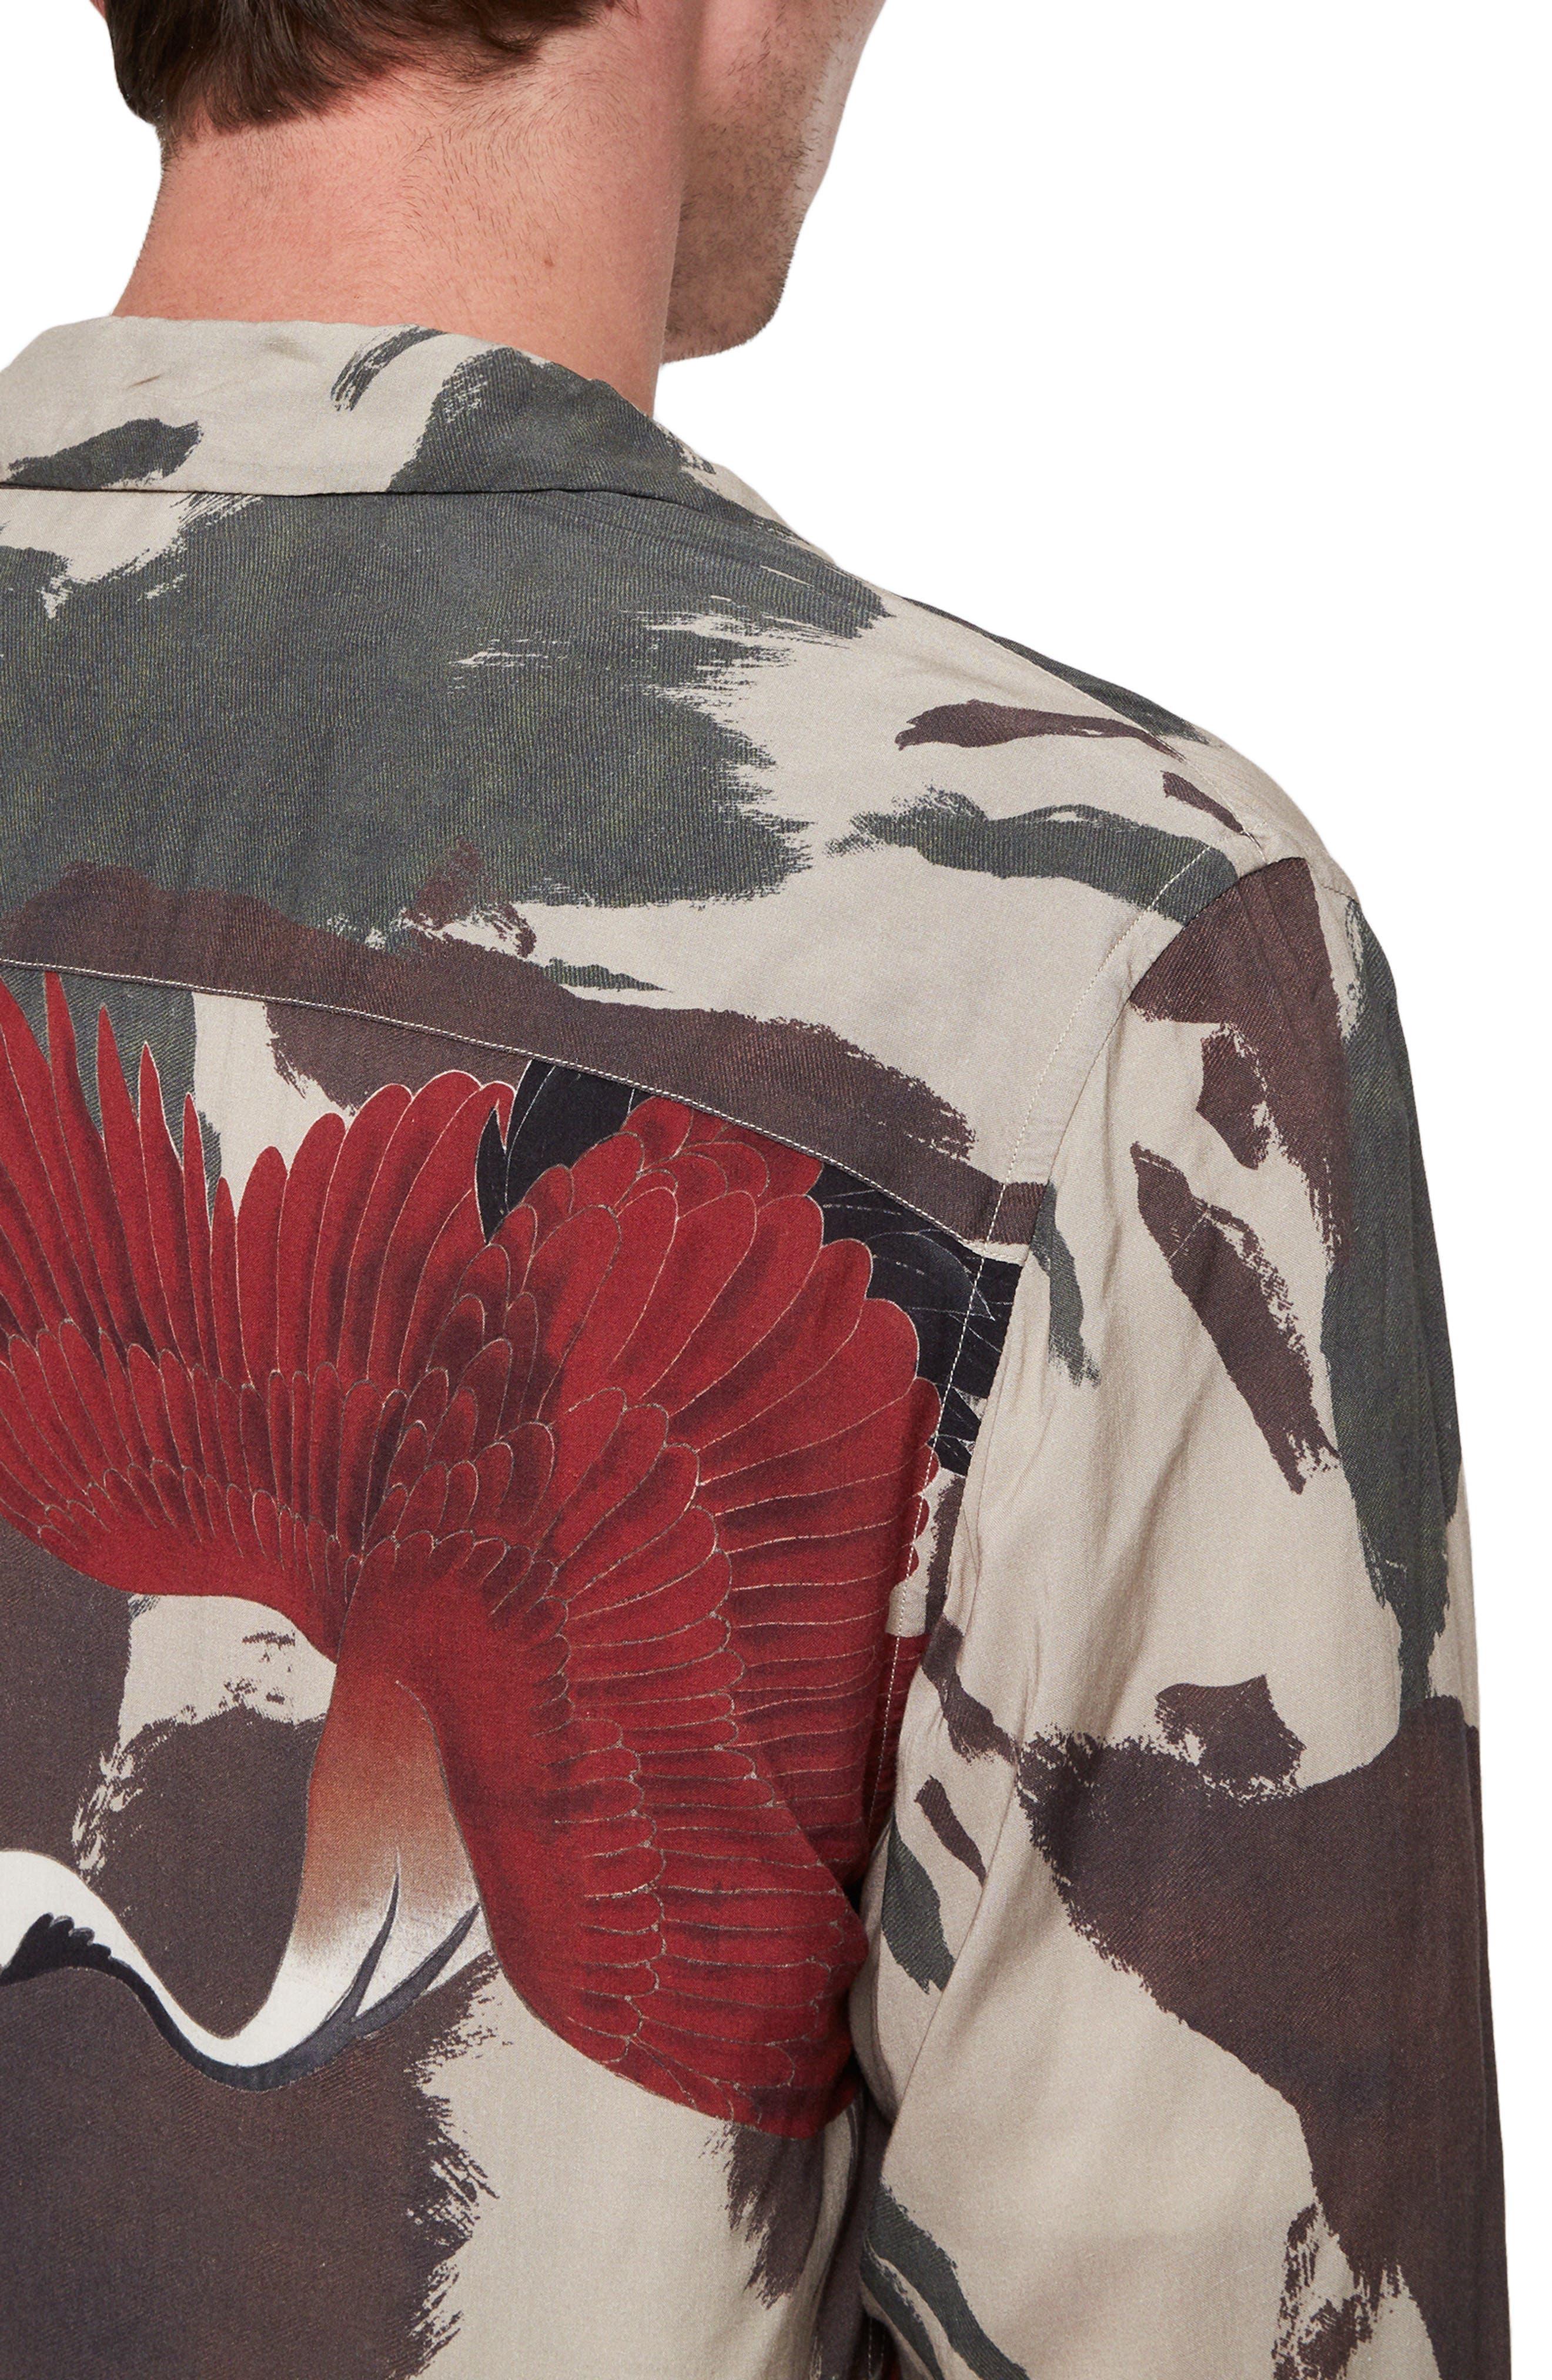 Lucerne Slim Fit Shirt,                             Alternate thumbnail 2, color,                             300